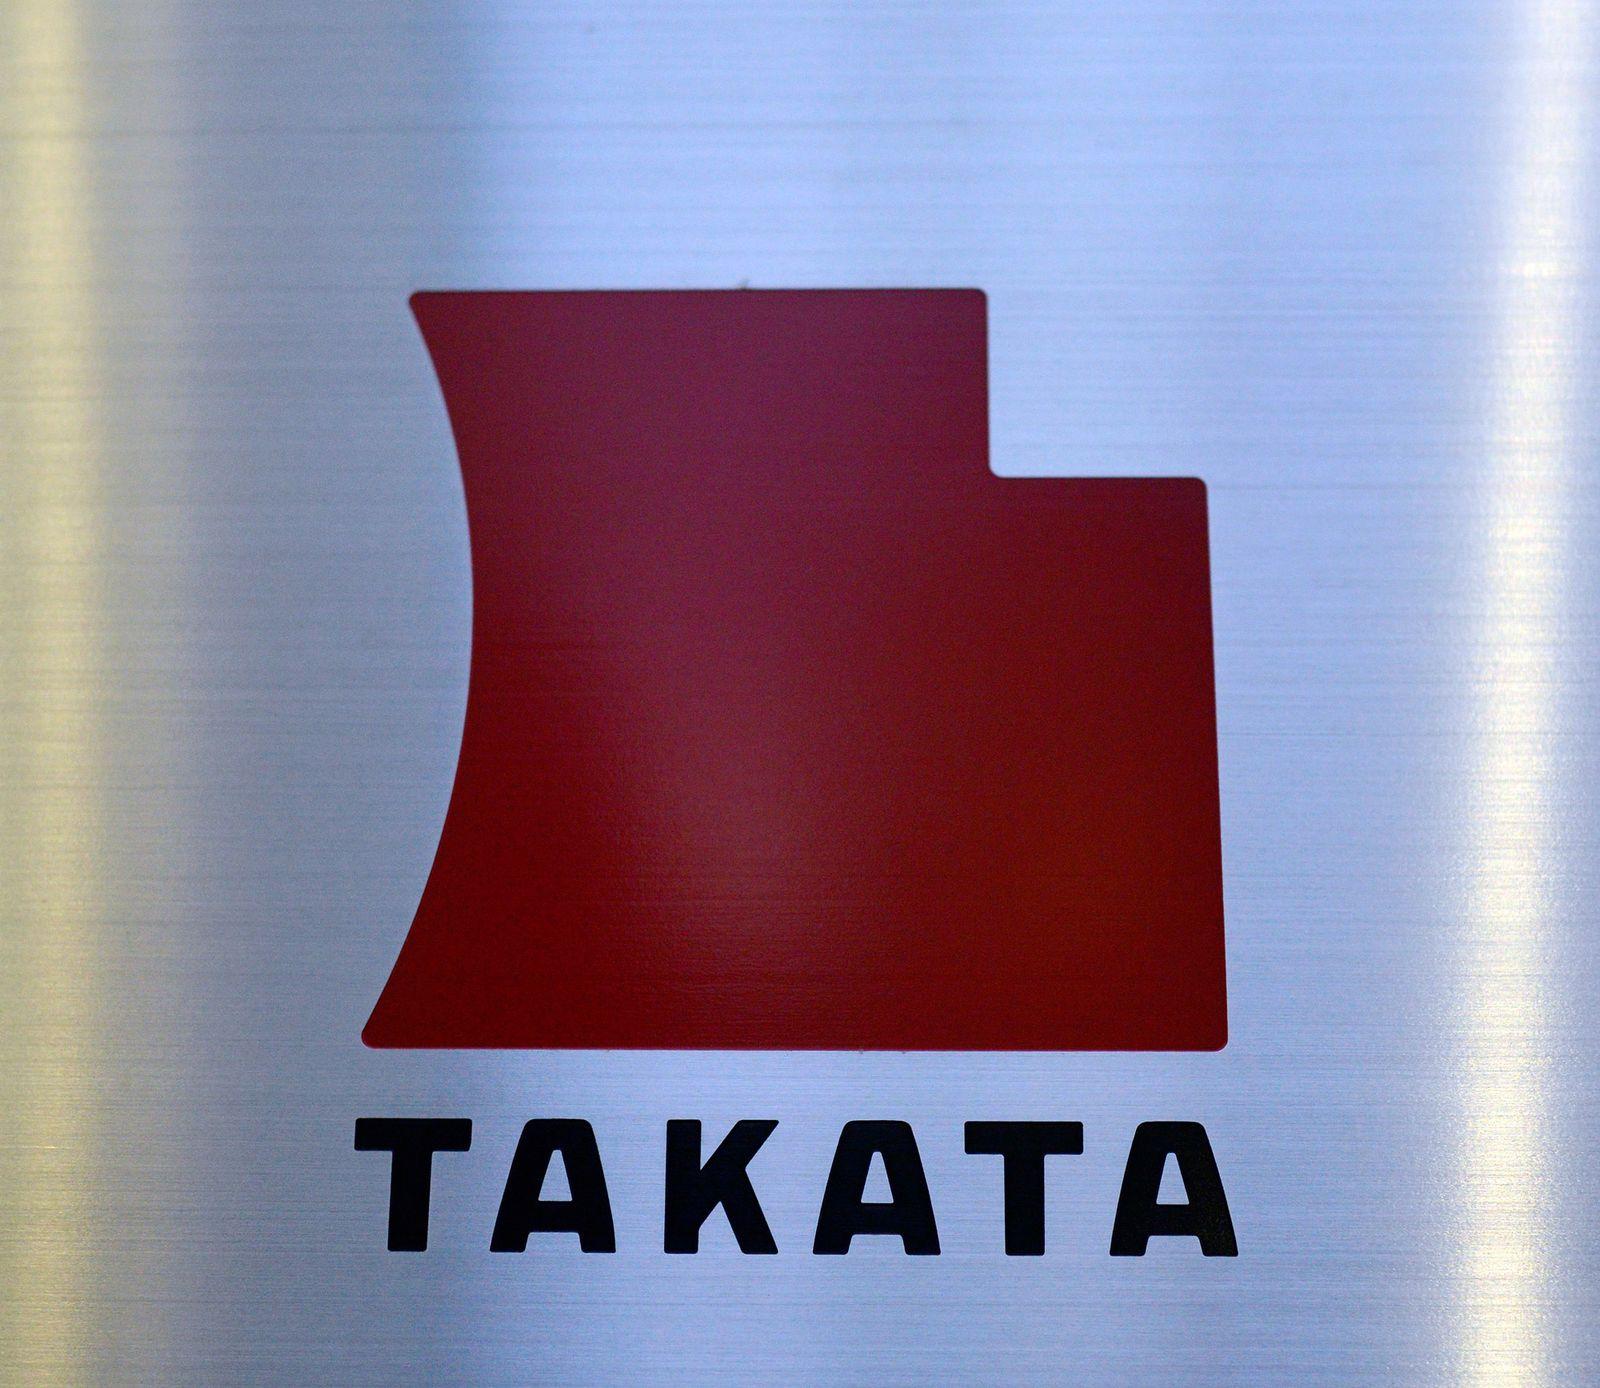 Takata / Symbol